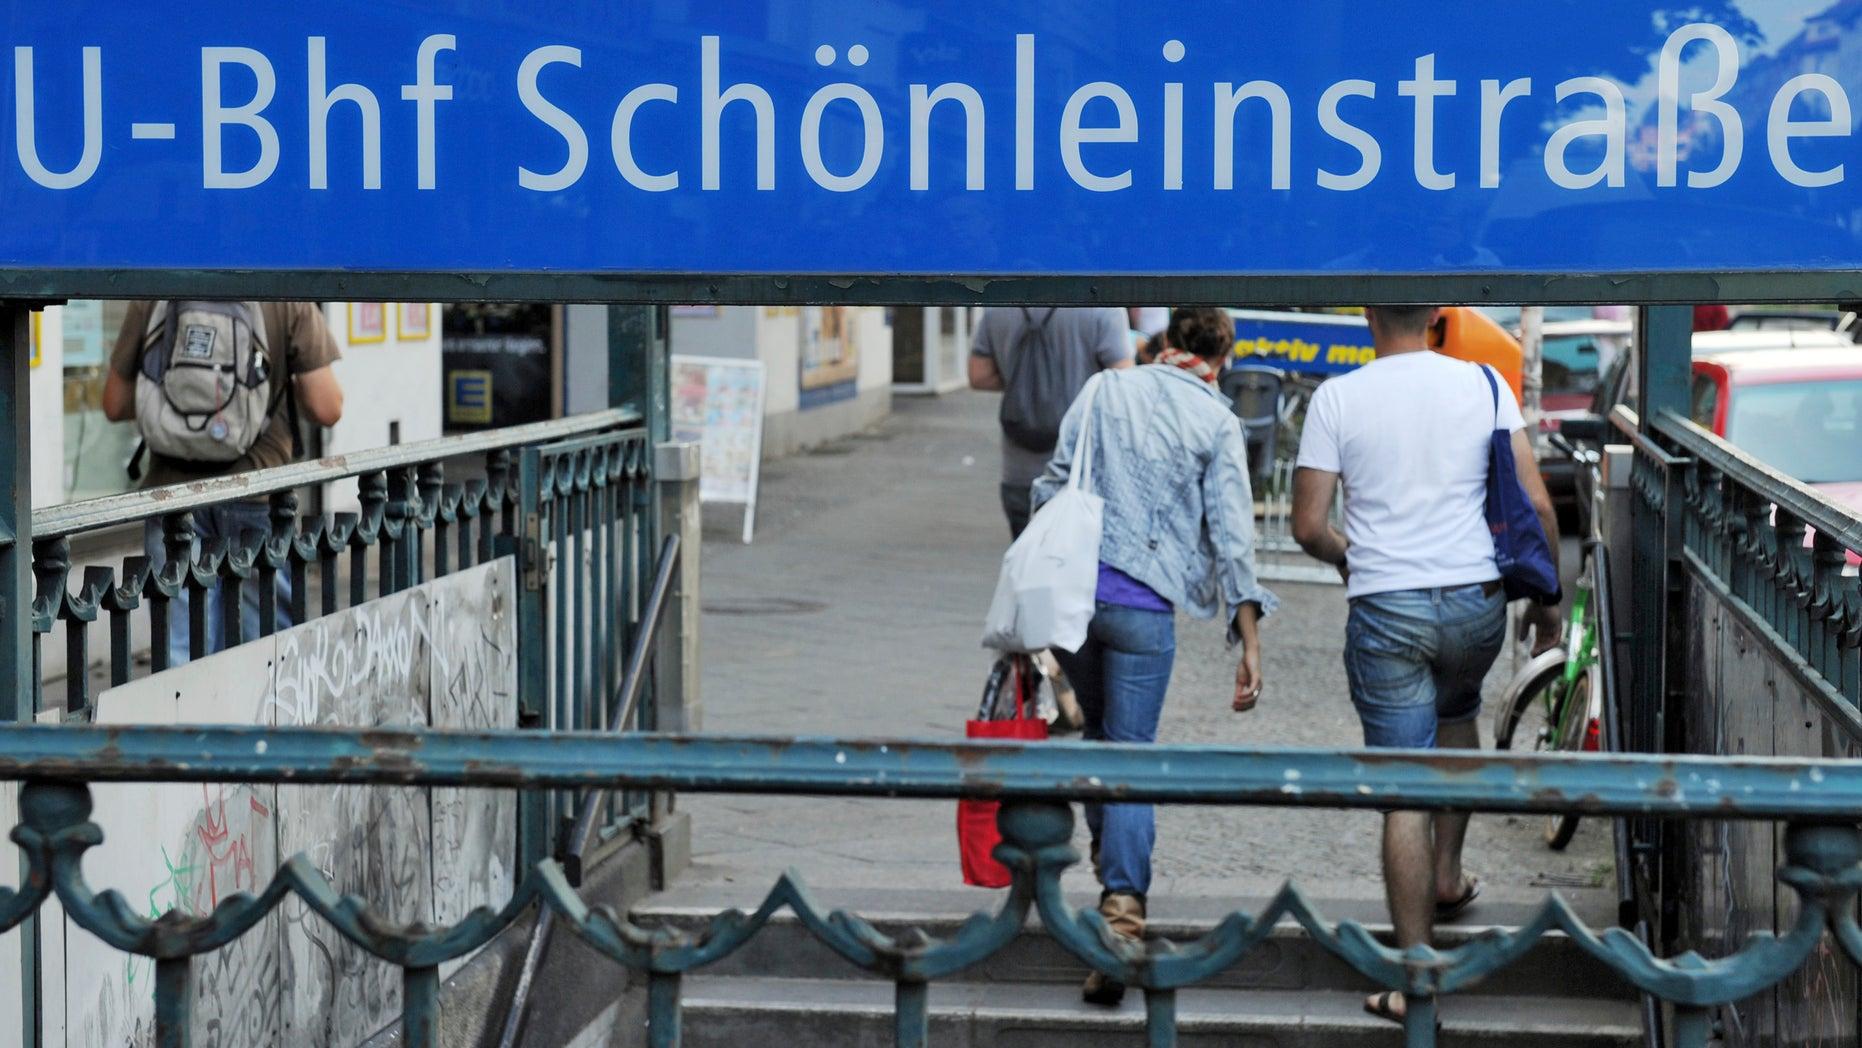 The subway station Schoenleinstrasse in Berlin, seen in a 2010 file photo.